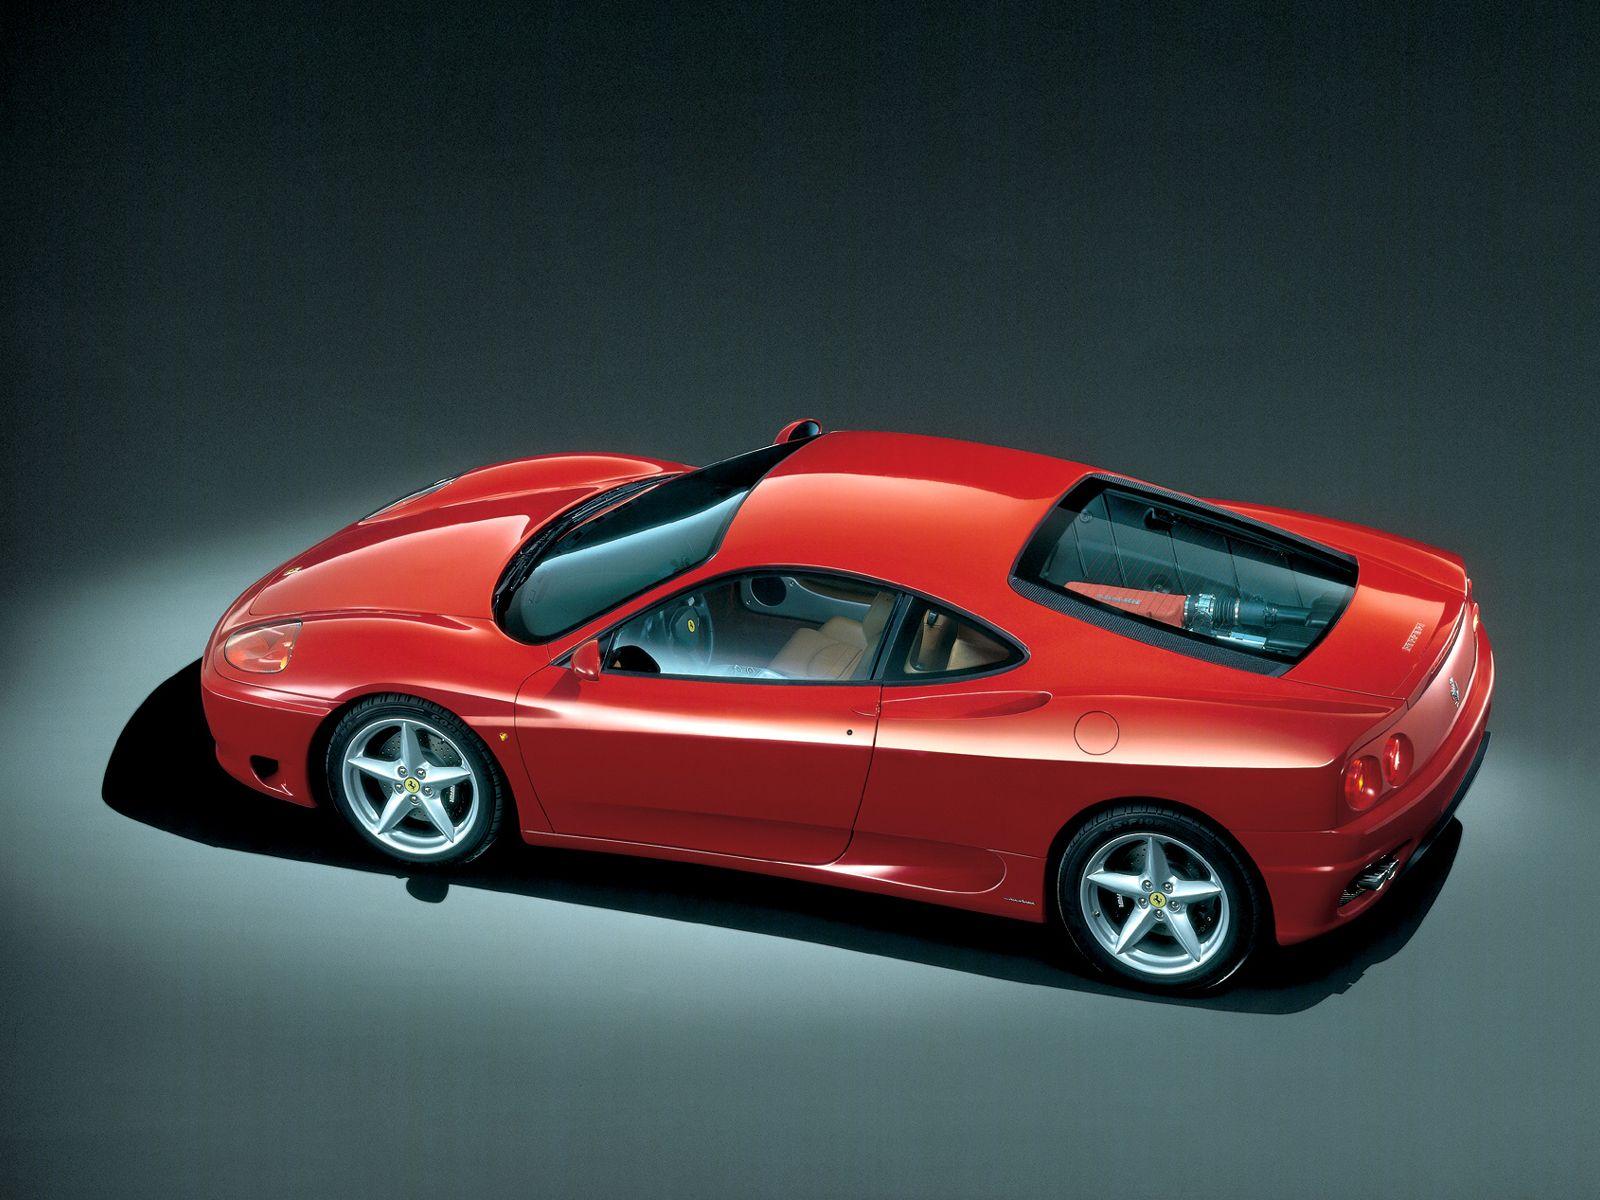 Ferrari 360 Modena Specs  1999, 2000, 2001, 2002, 2003